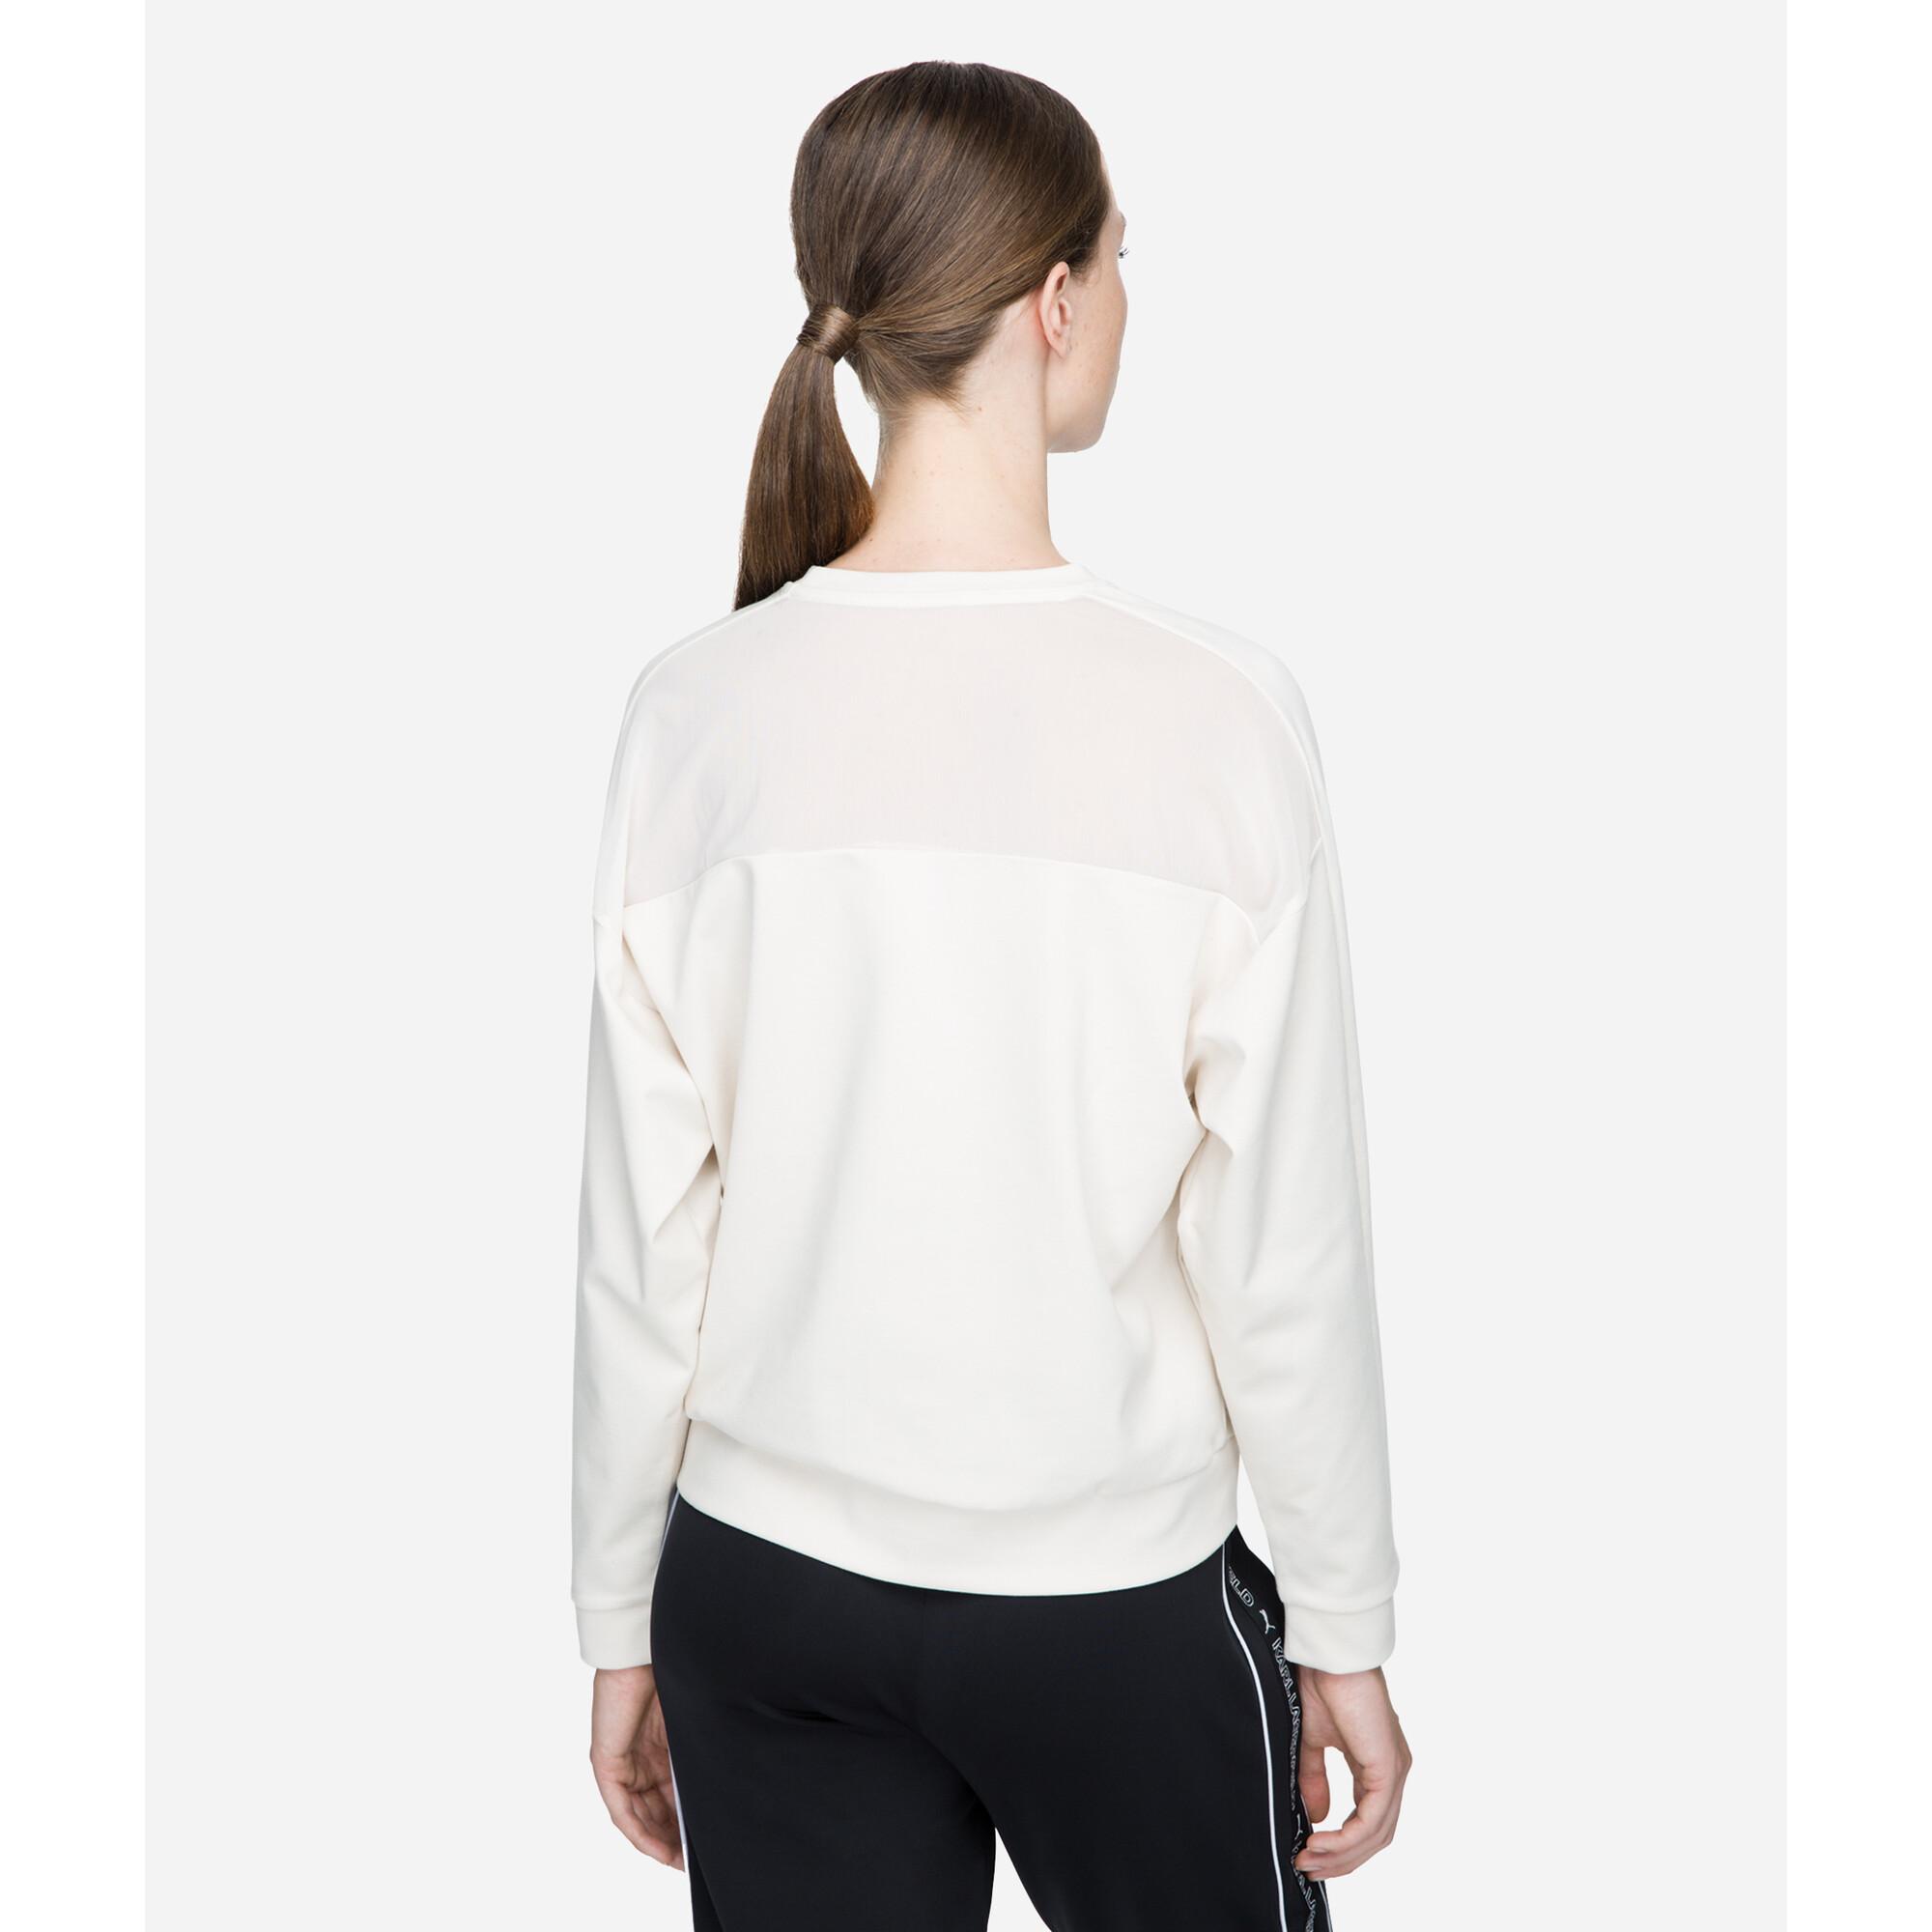 Image Puma PUMA x KARL LAGERFELD Women's Sweater #2